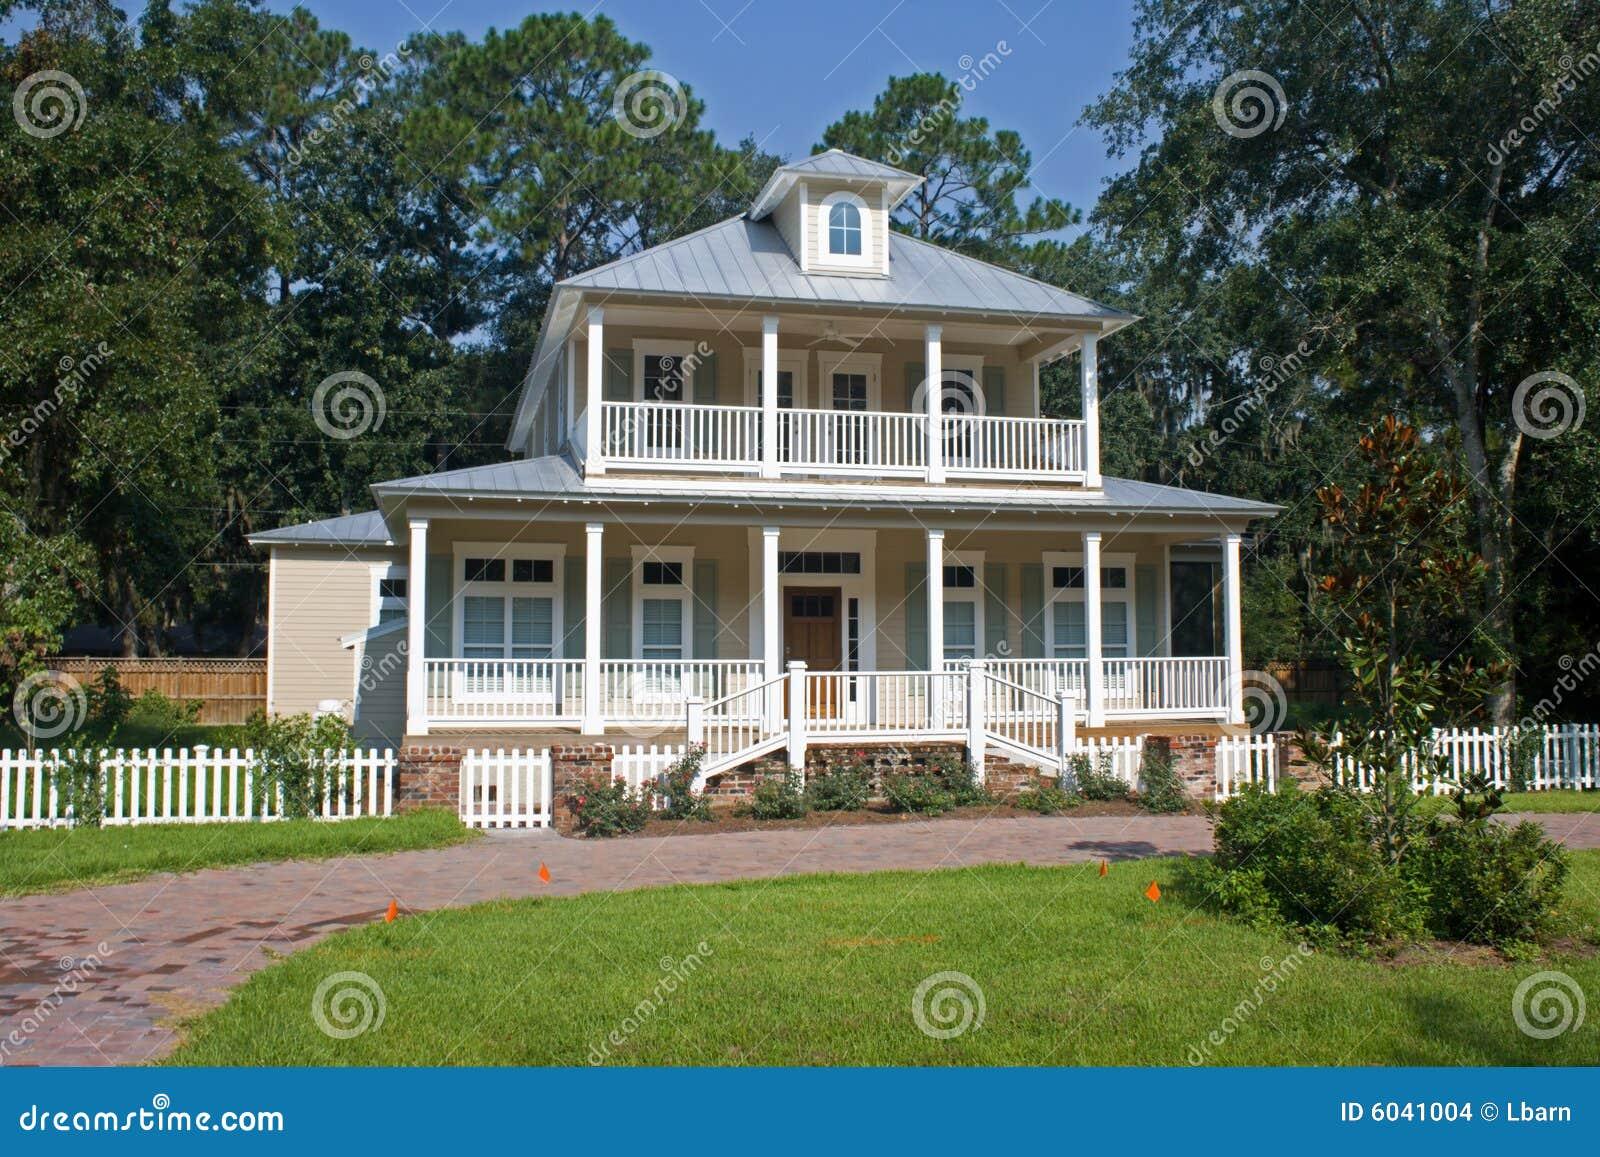 Southern Georgia Coastal Home Stock Images Image 6041004